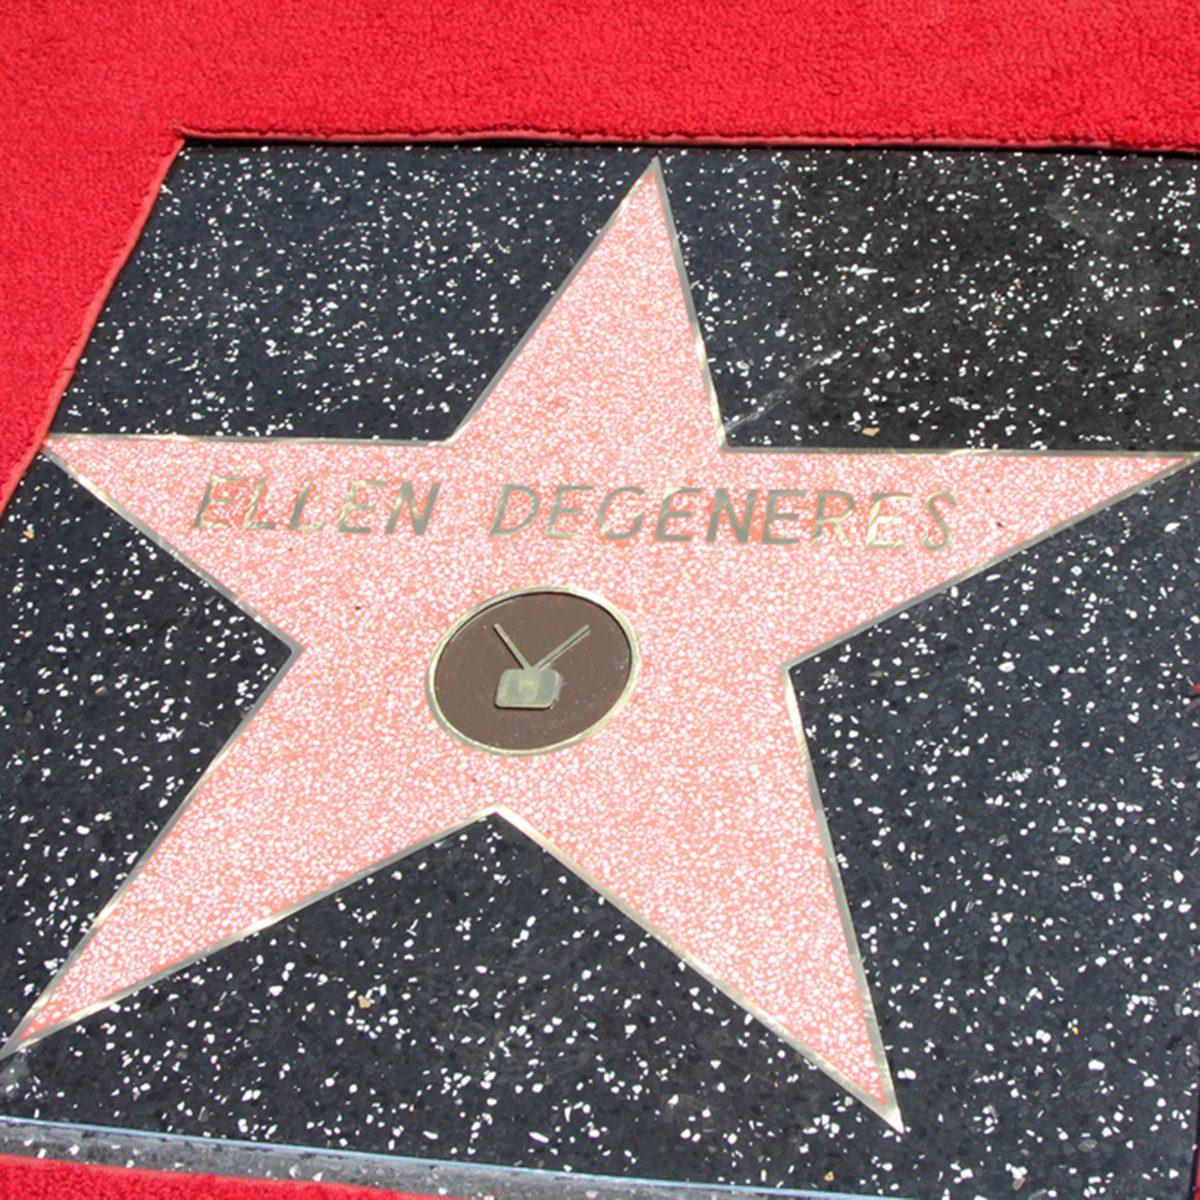 Ellen DeGeneres Star at the Hollywood Walk of Fame Ceremony for Ellen Degeneres at W Hollywood on September 4, 2012 in Los Angeles, CA